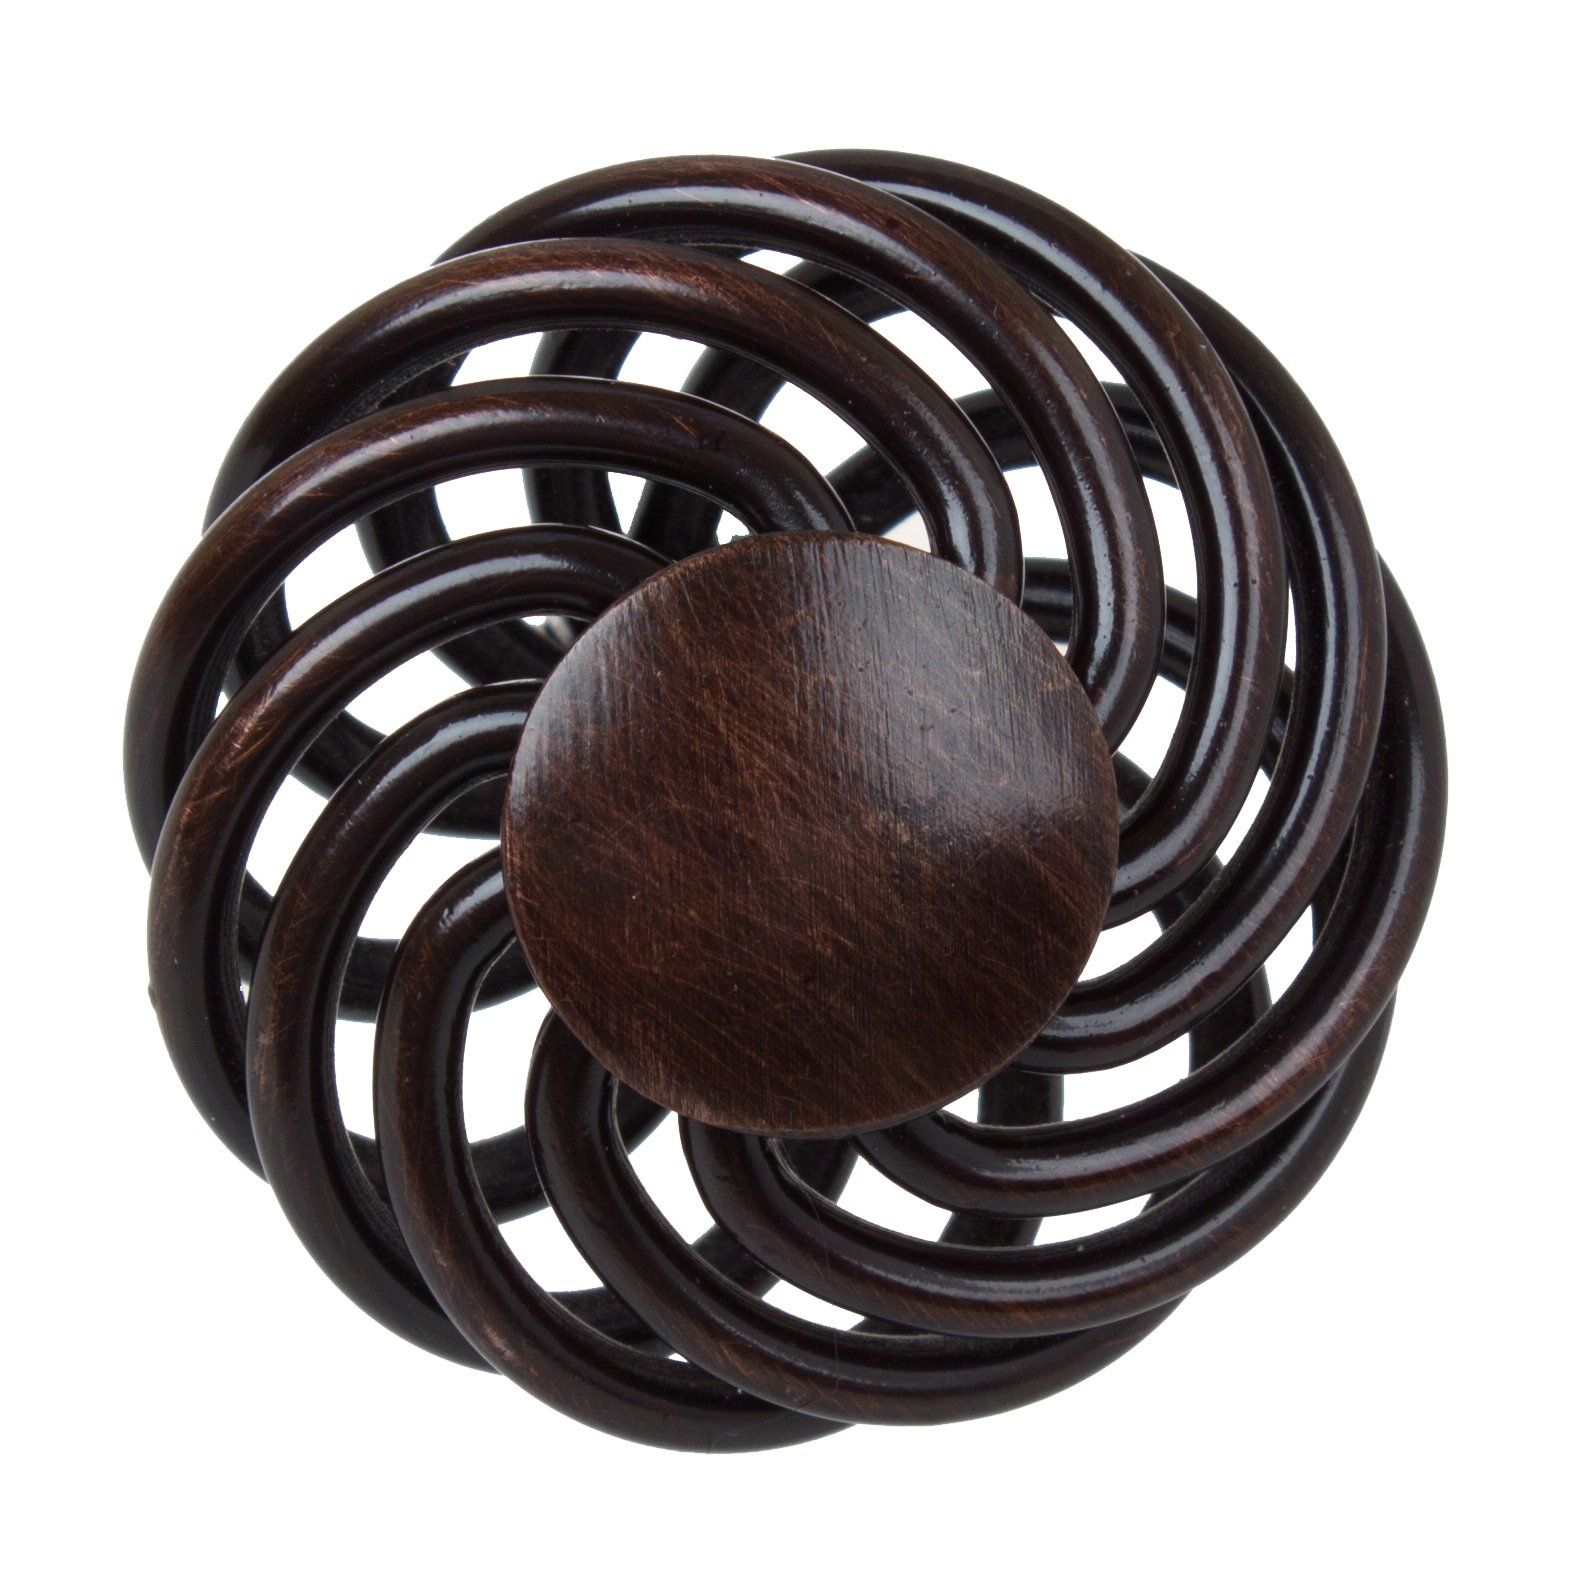 GlideRite Hardware 3072-ORB-100 Round Birdcage Cabinet Knob, 100 Pack, 1.625'', Oil Rubbed Bronze by GlideRite Hardware (Image #3)